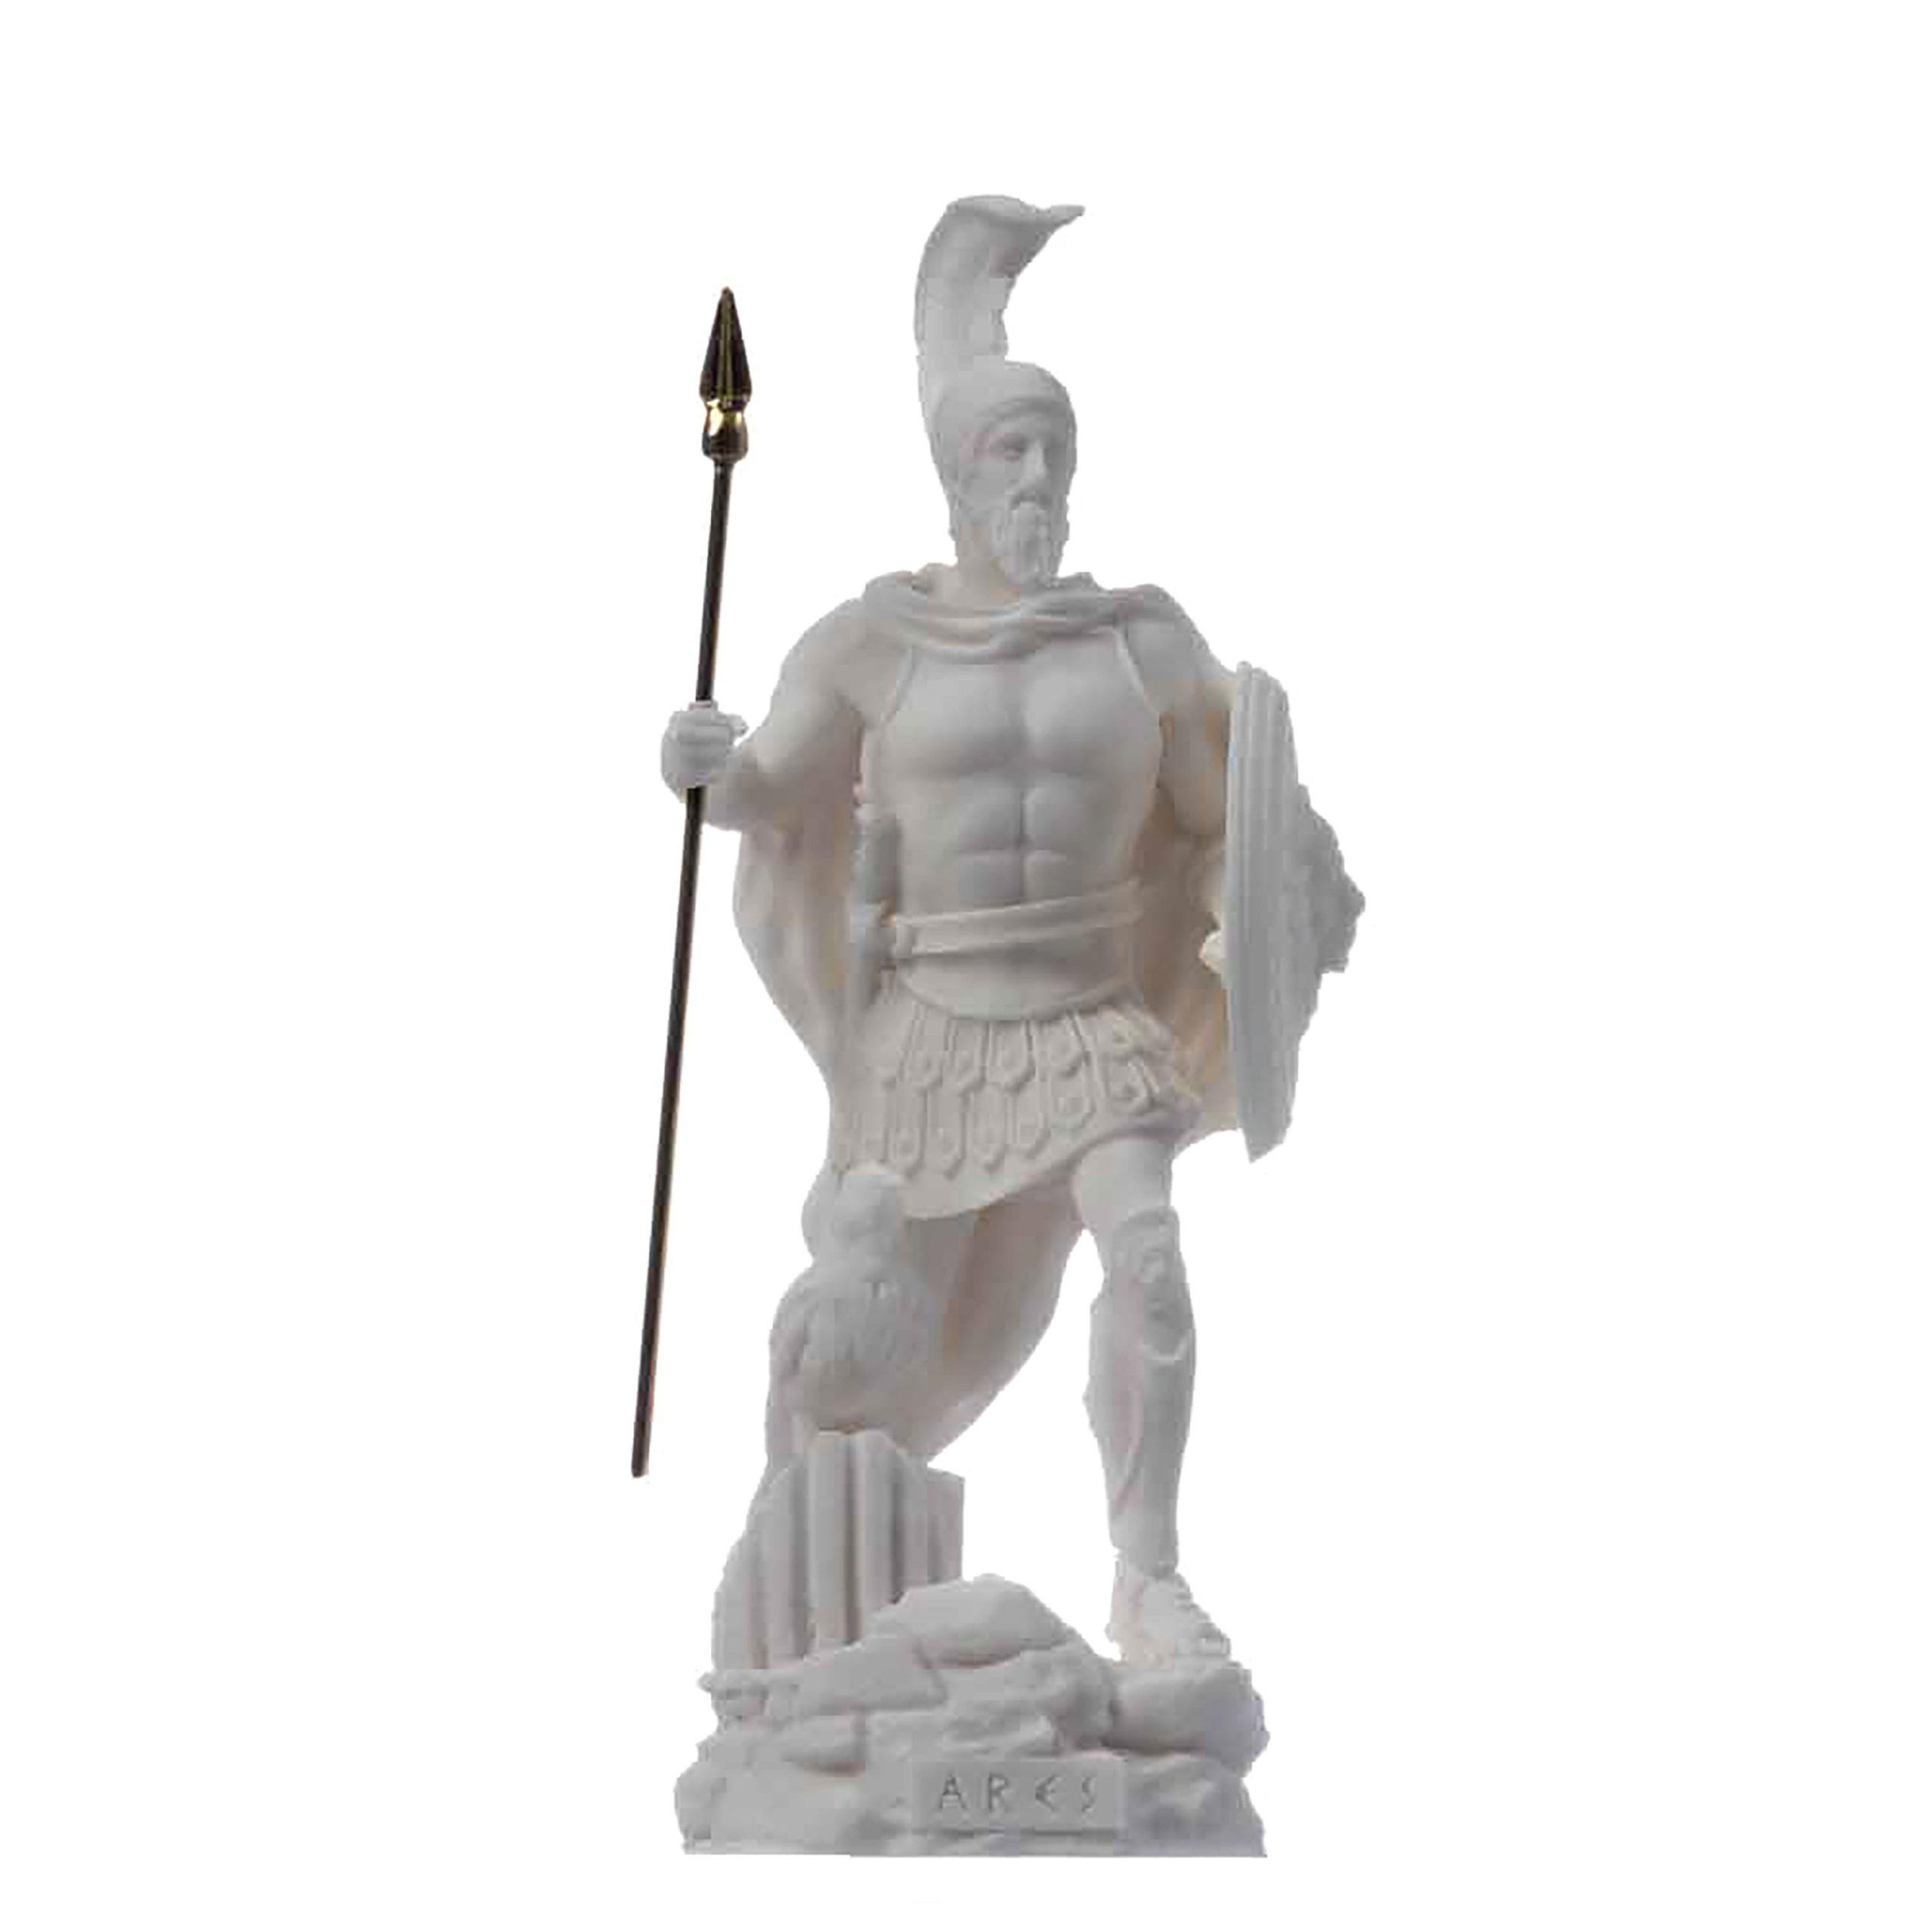 "Ares Mars God of War Zeus Son Roman Statue Alabaster 6.3"""